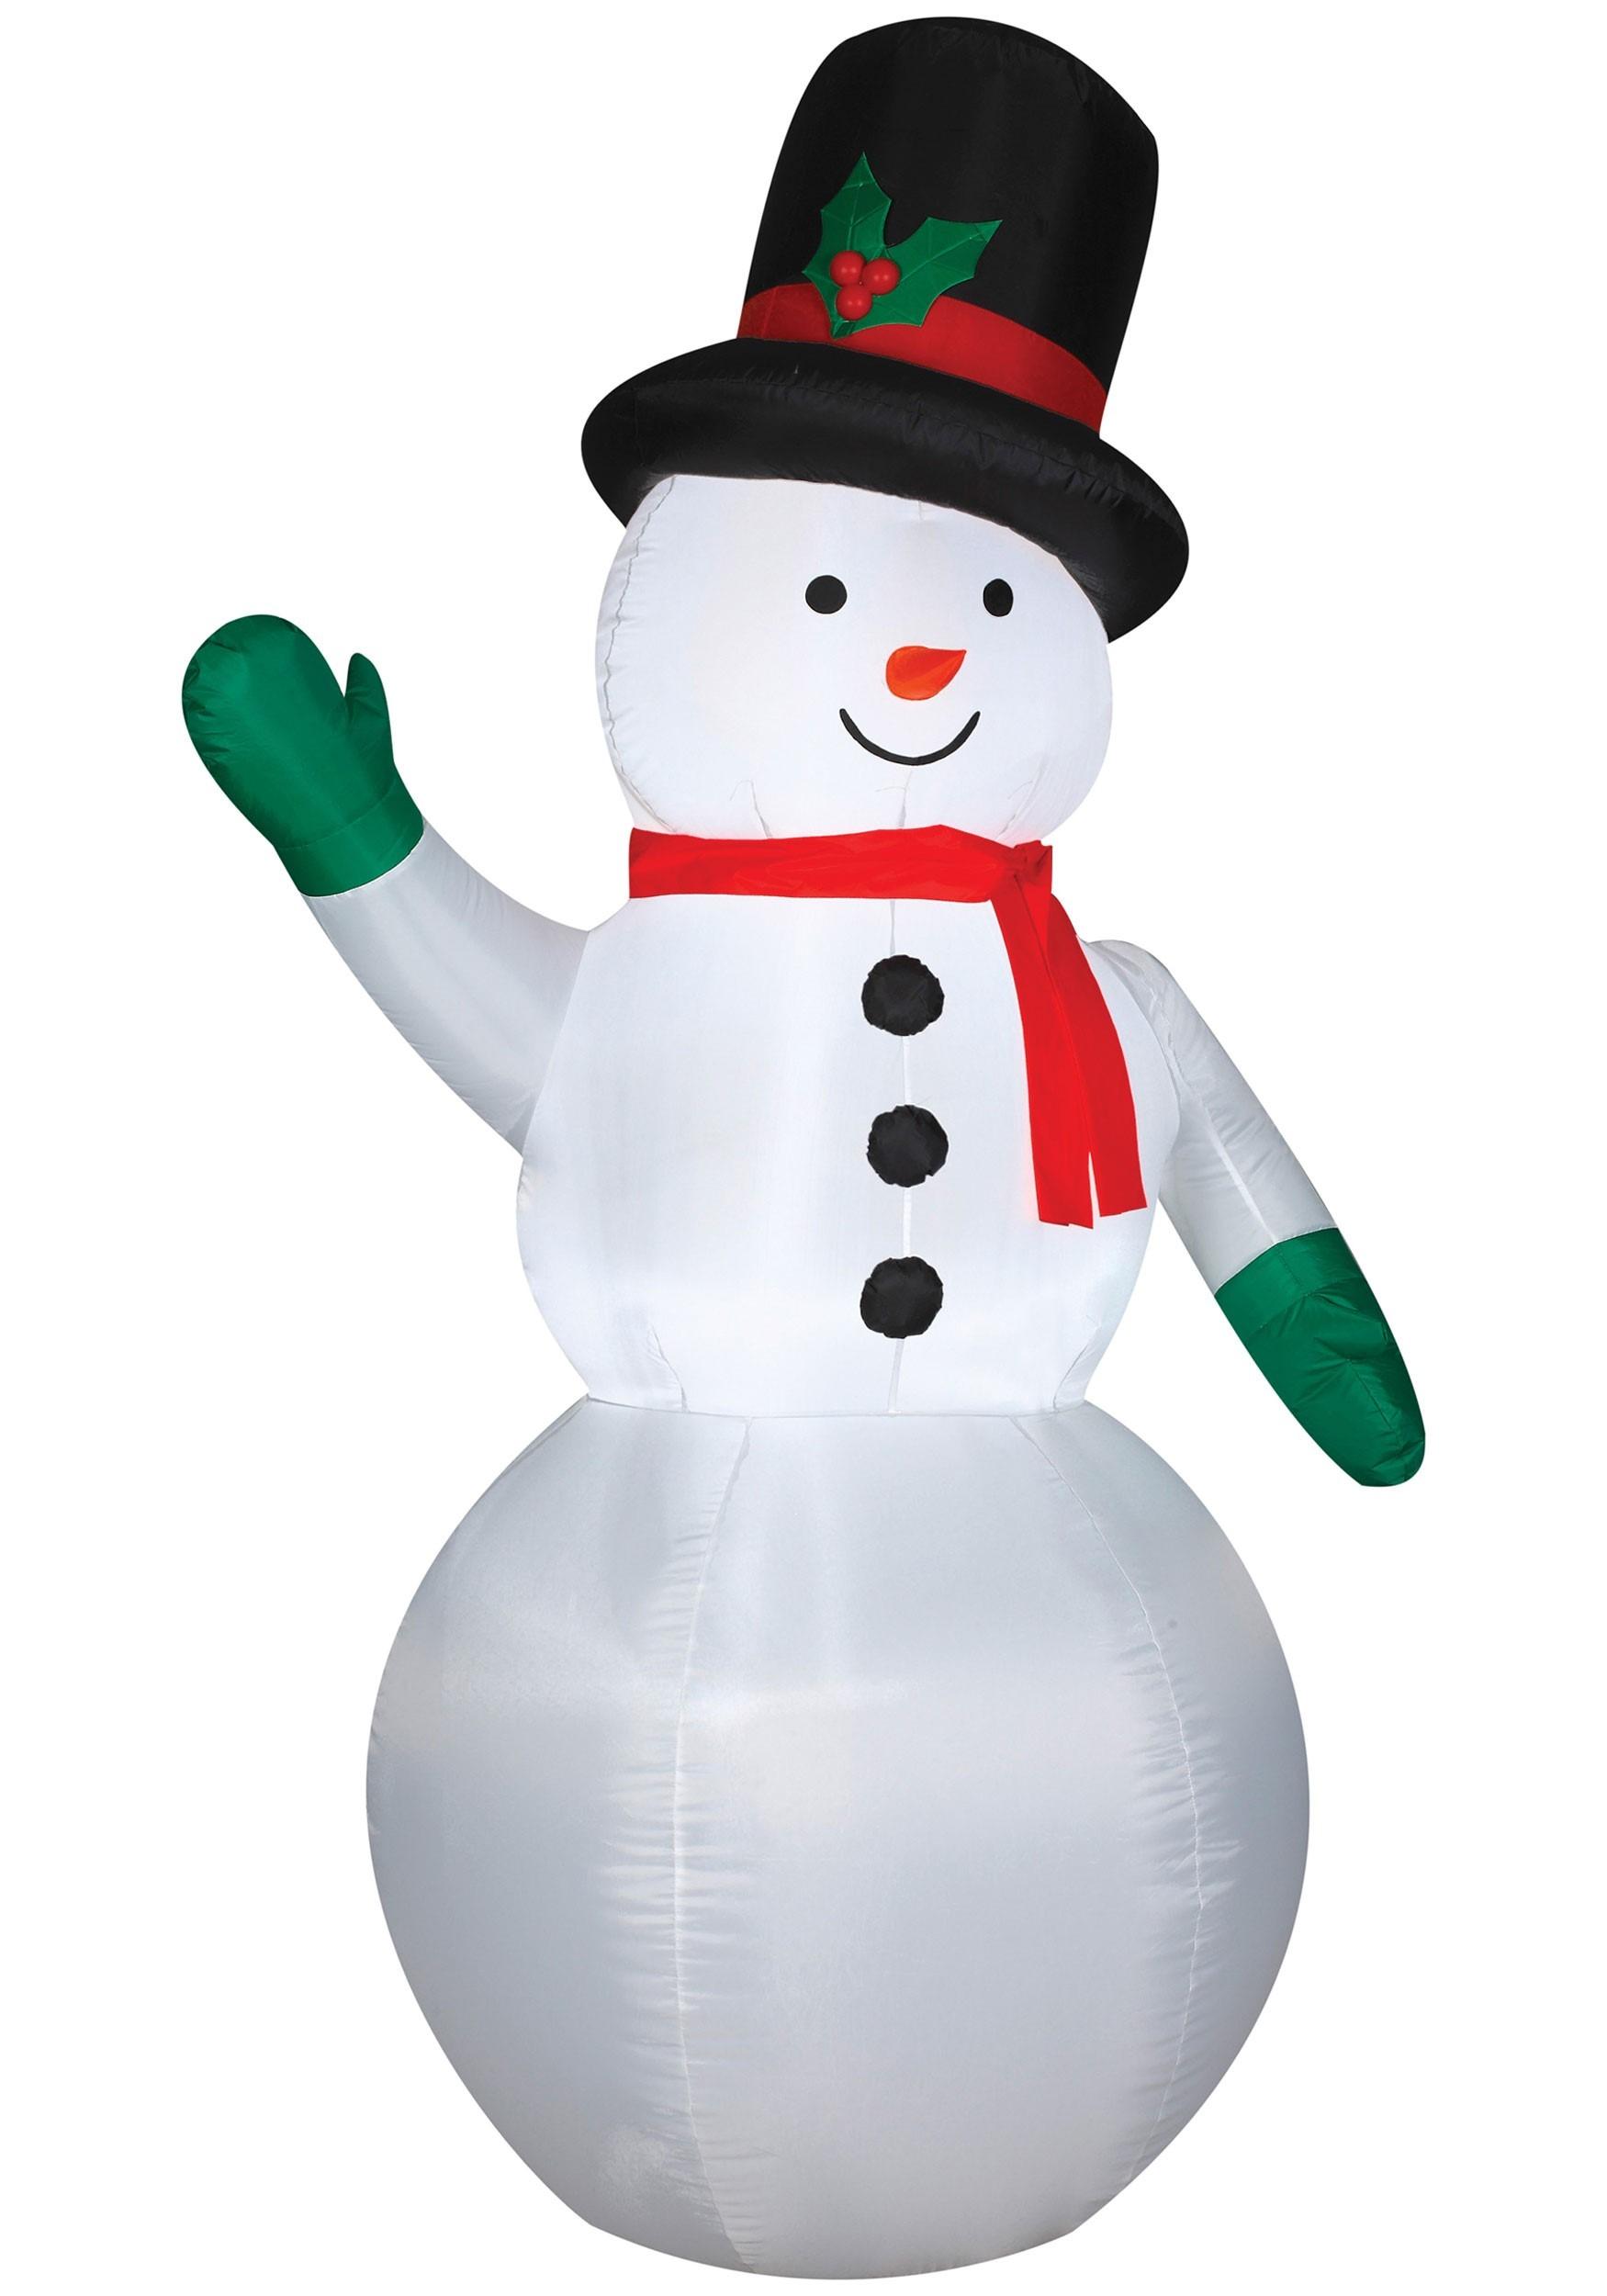 Snowman Inflatable Decoration